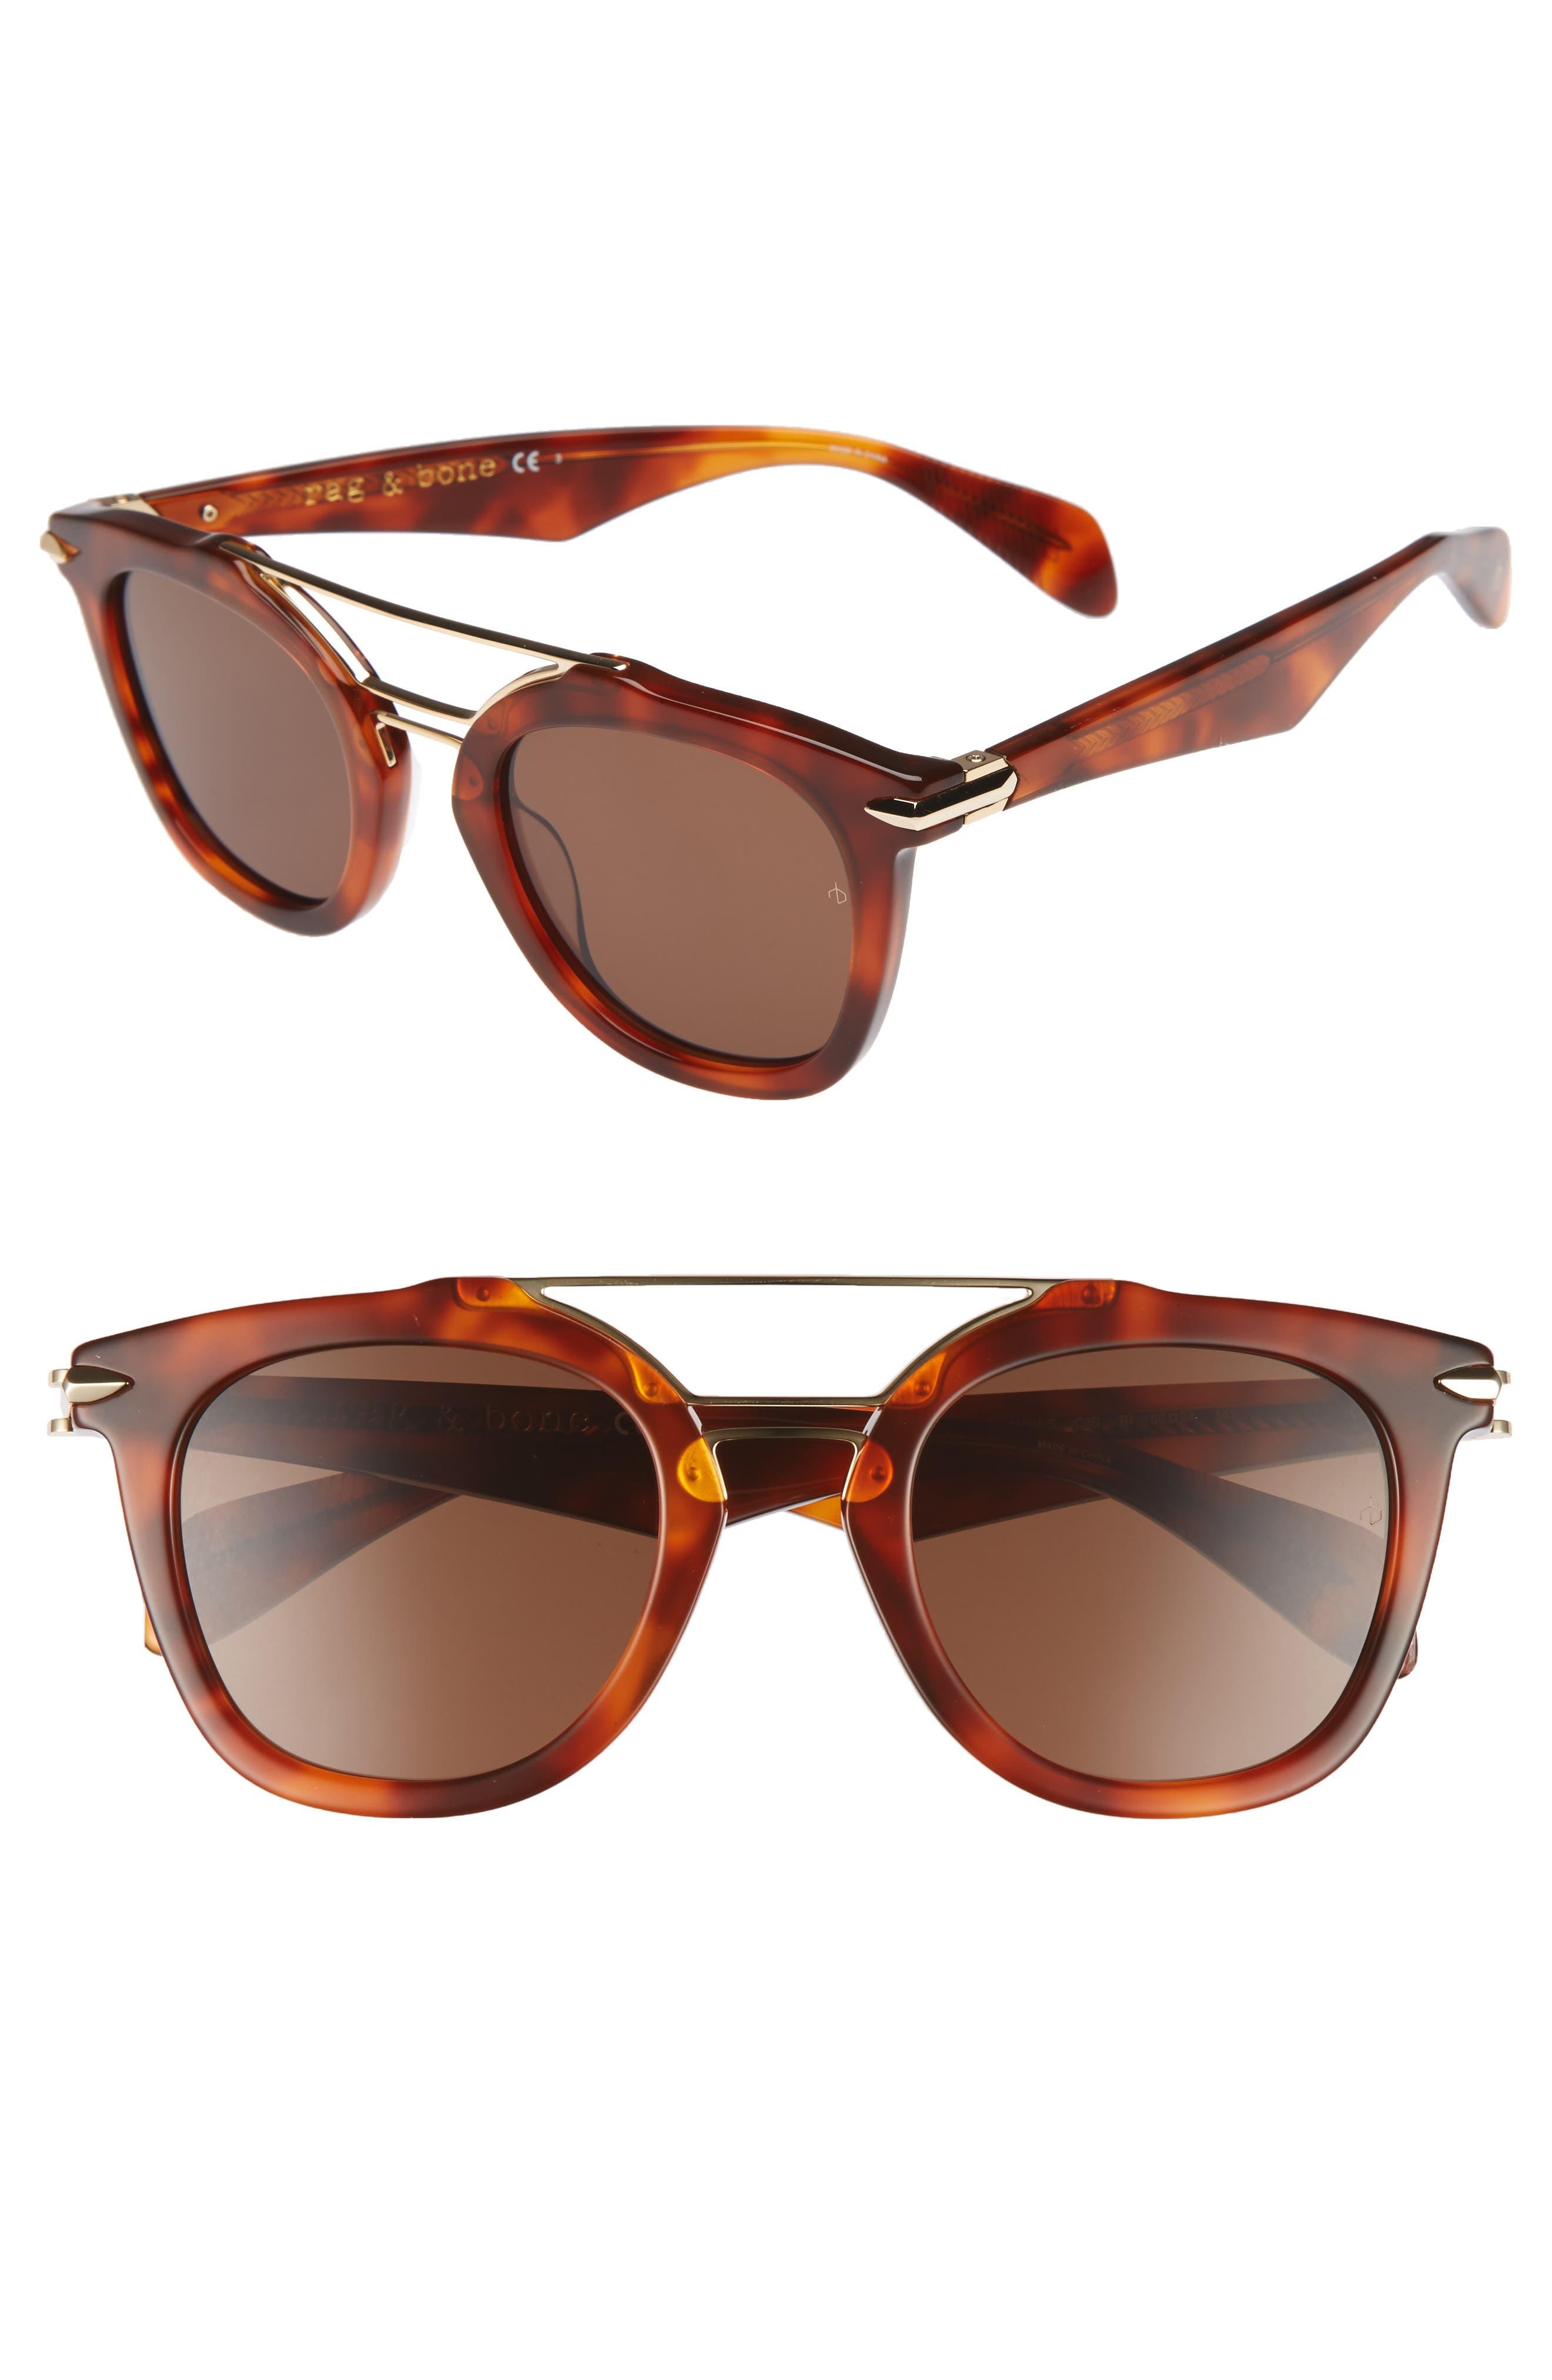 50mm Round Aviator Sunglasses,                             Main thumbnail 1, color,                             Havana Honey